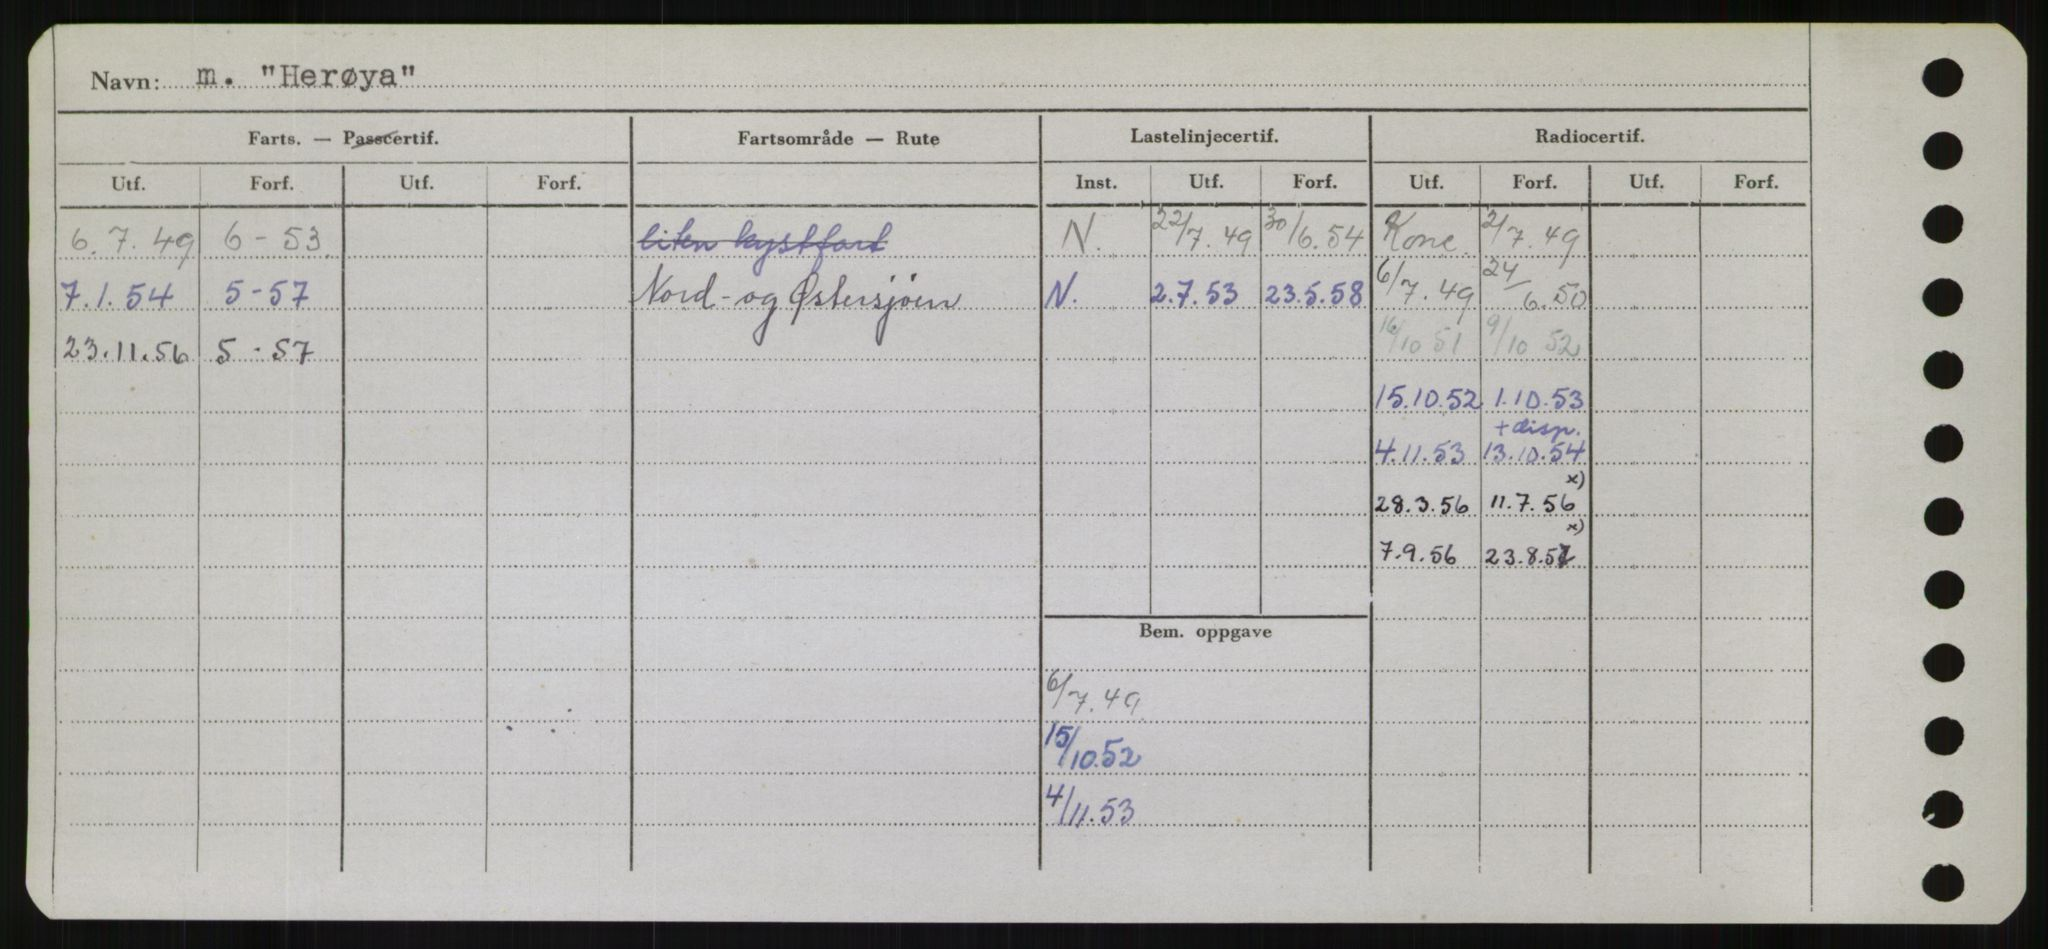 RA, Sjøfartsdirektoratet med forløpere, Skipsmålingen, H/Hb/L0002: Fartøy, E-H, s. 390